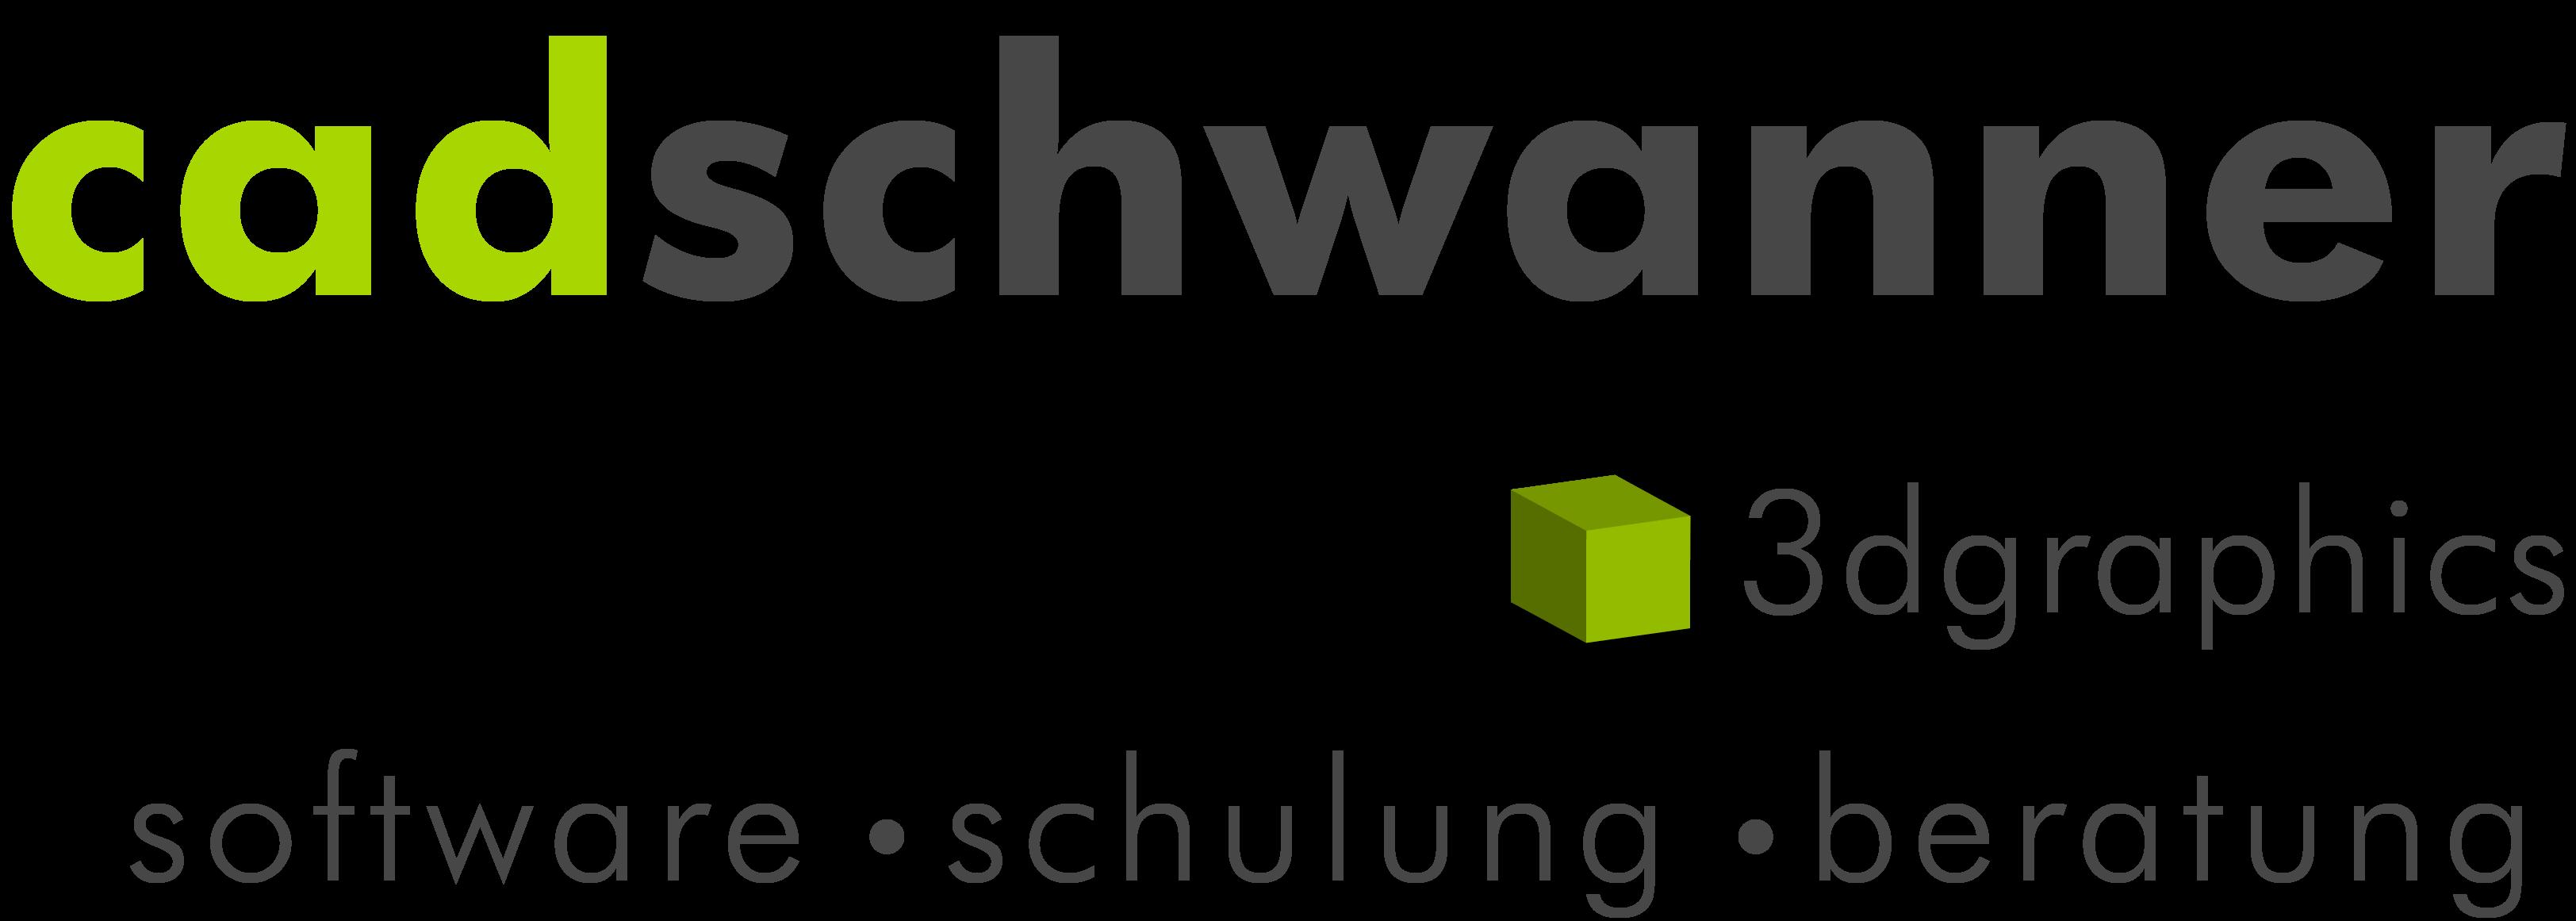 cadschwanner